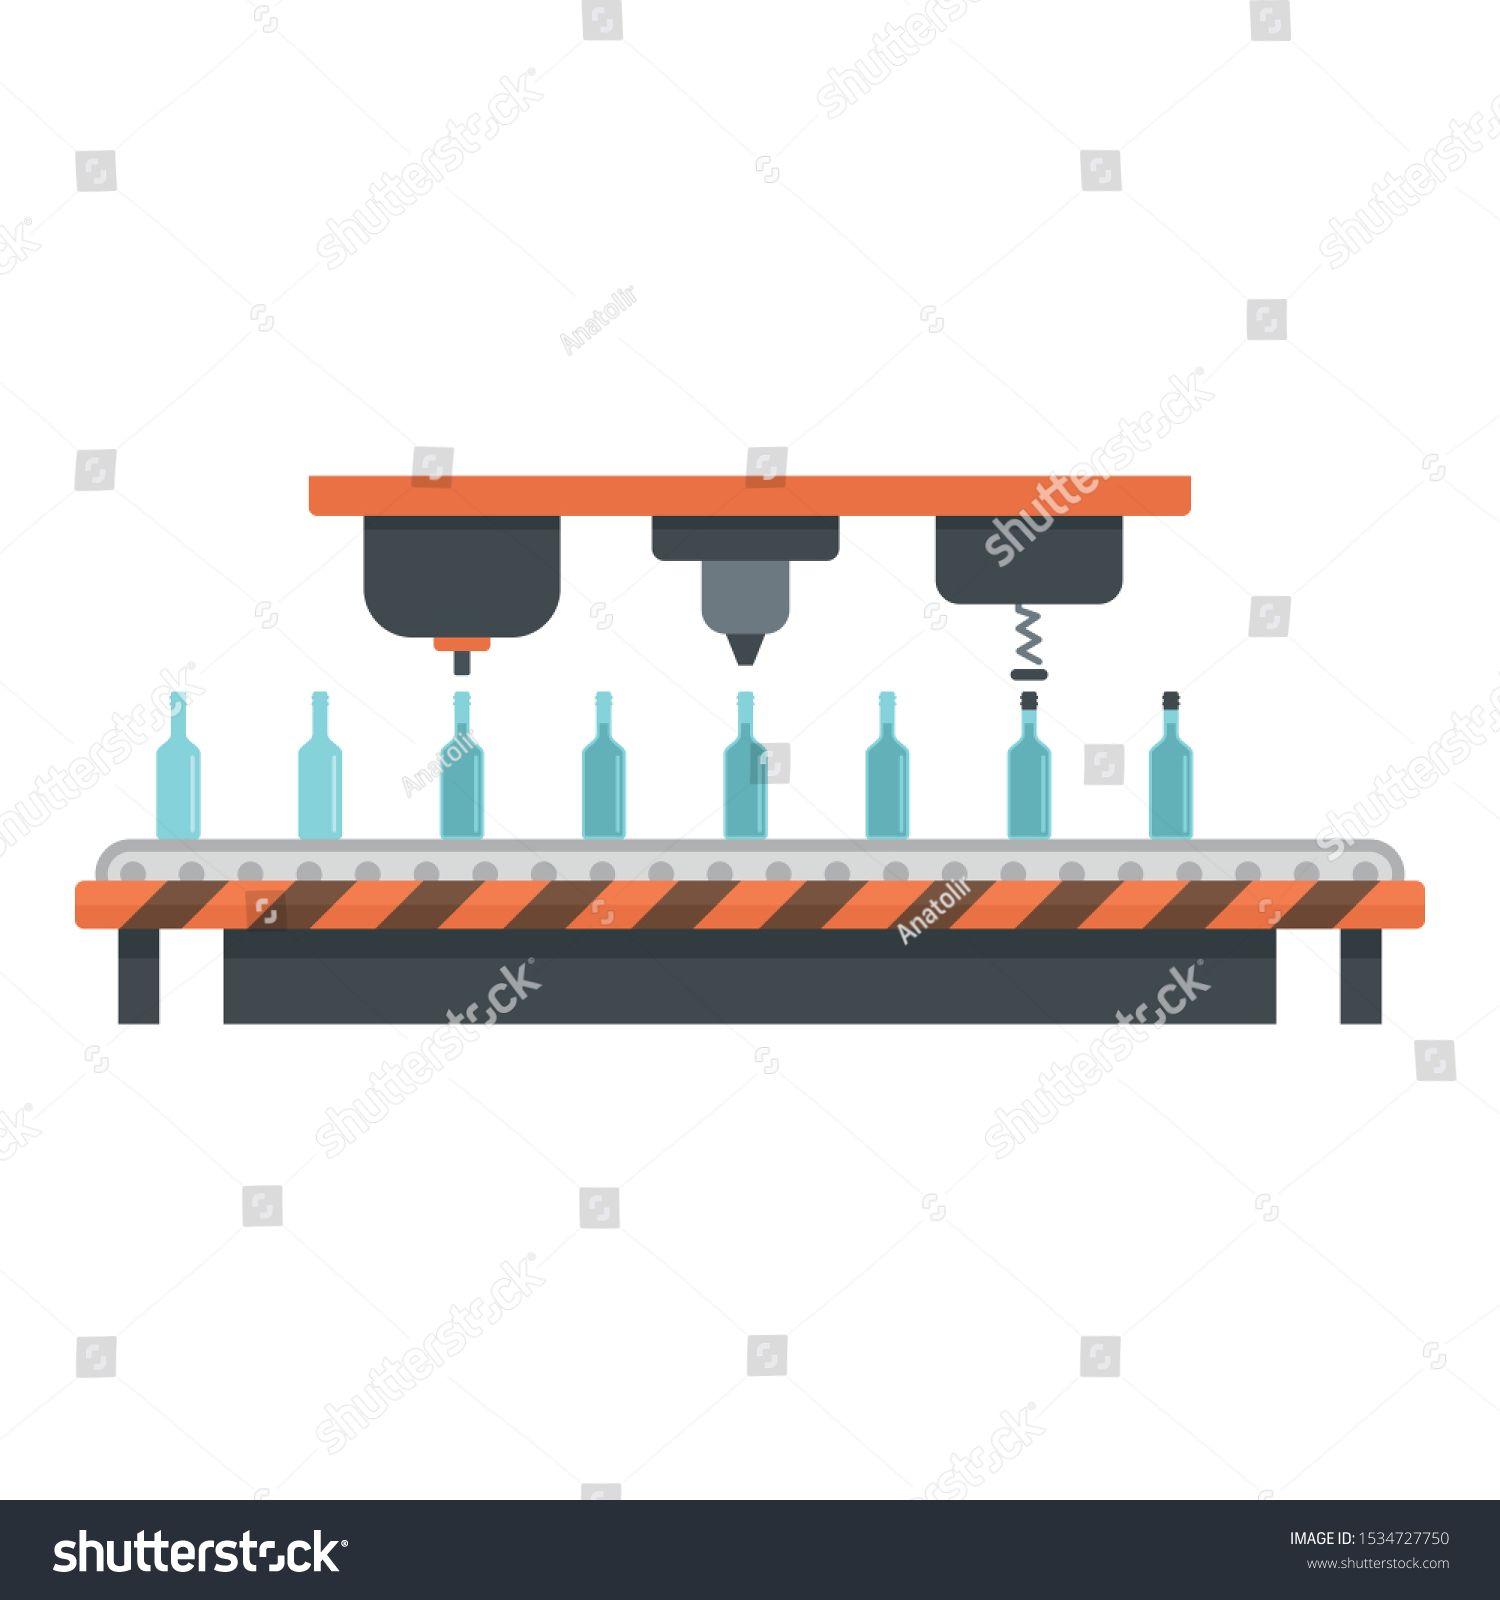 Bottle drink assembly line icon Flat illustration of bottle drink assembly line vector icon for web design